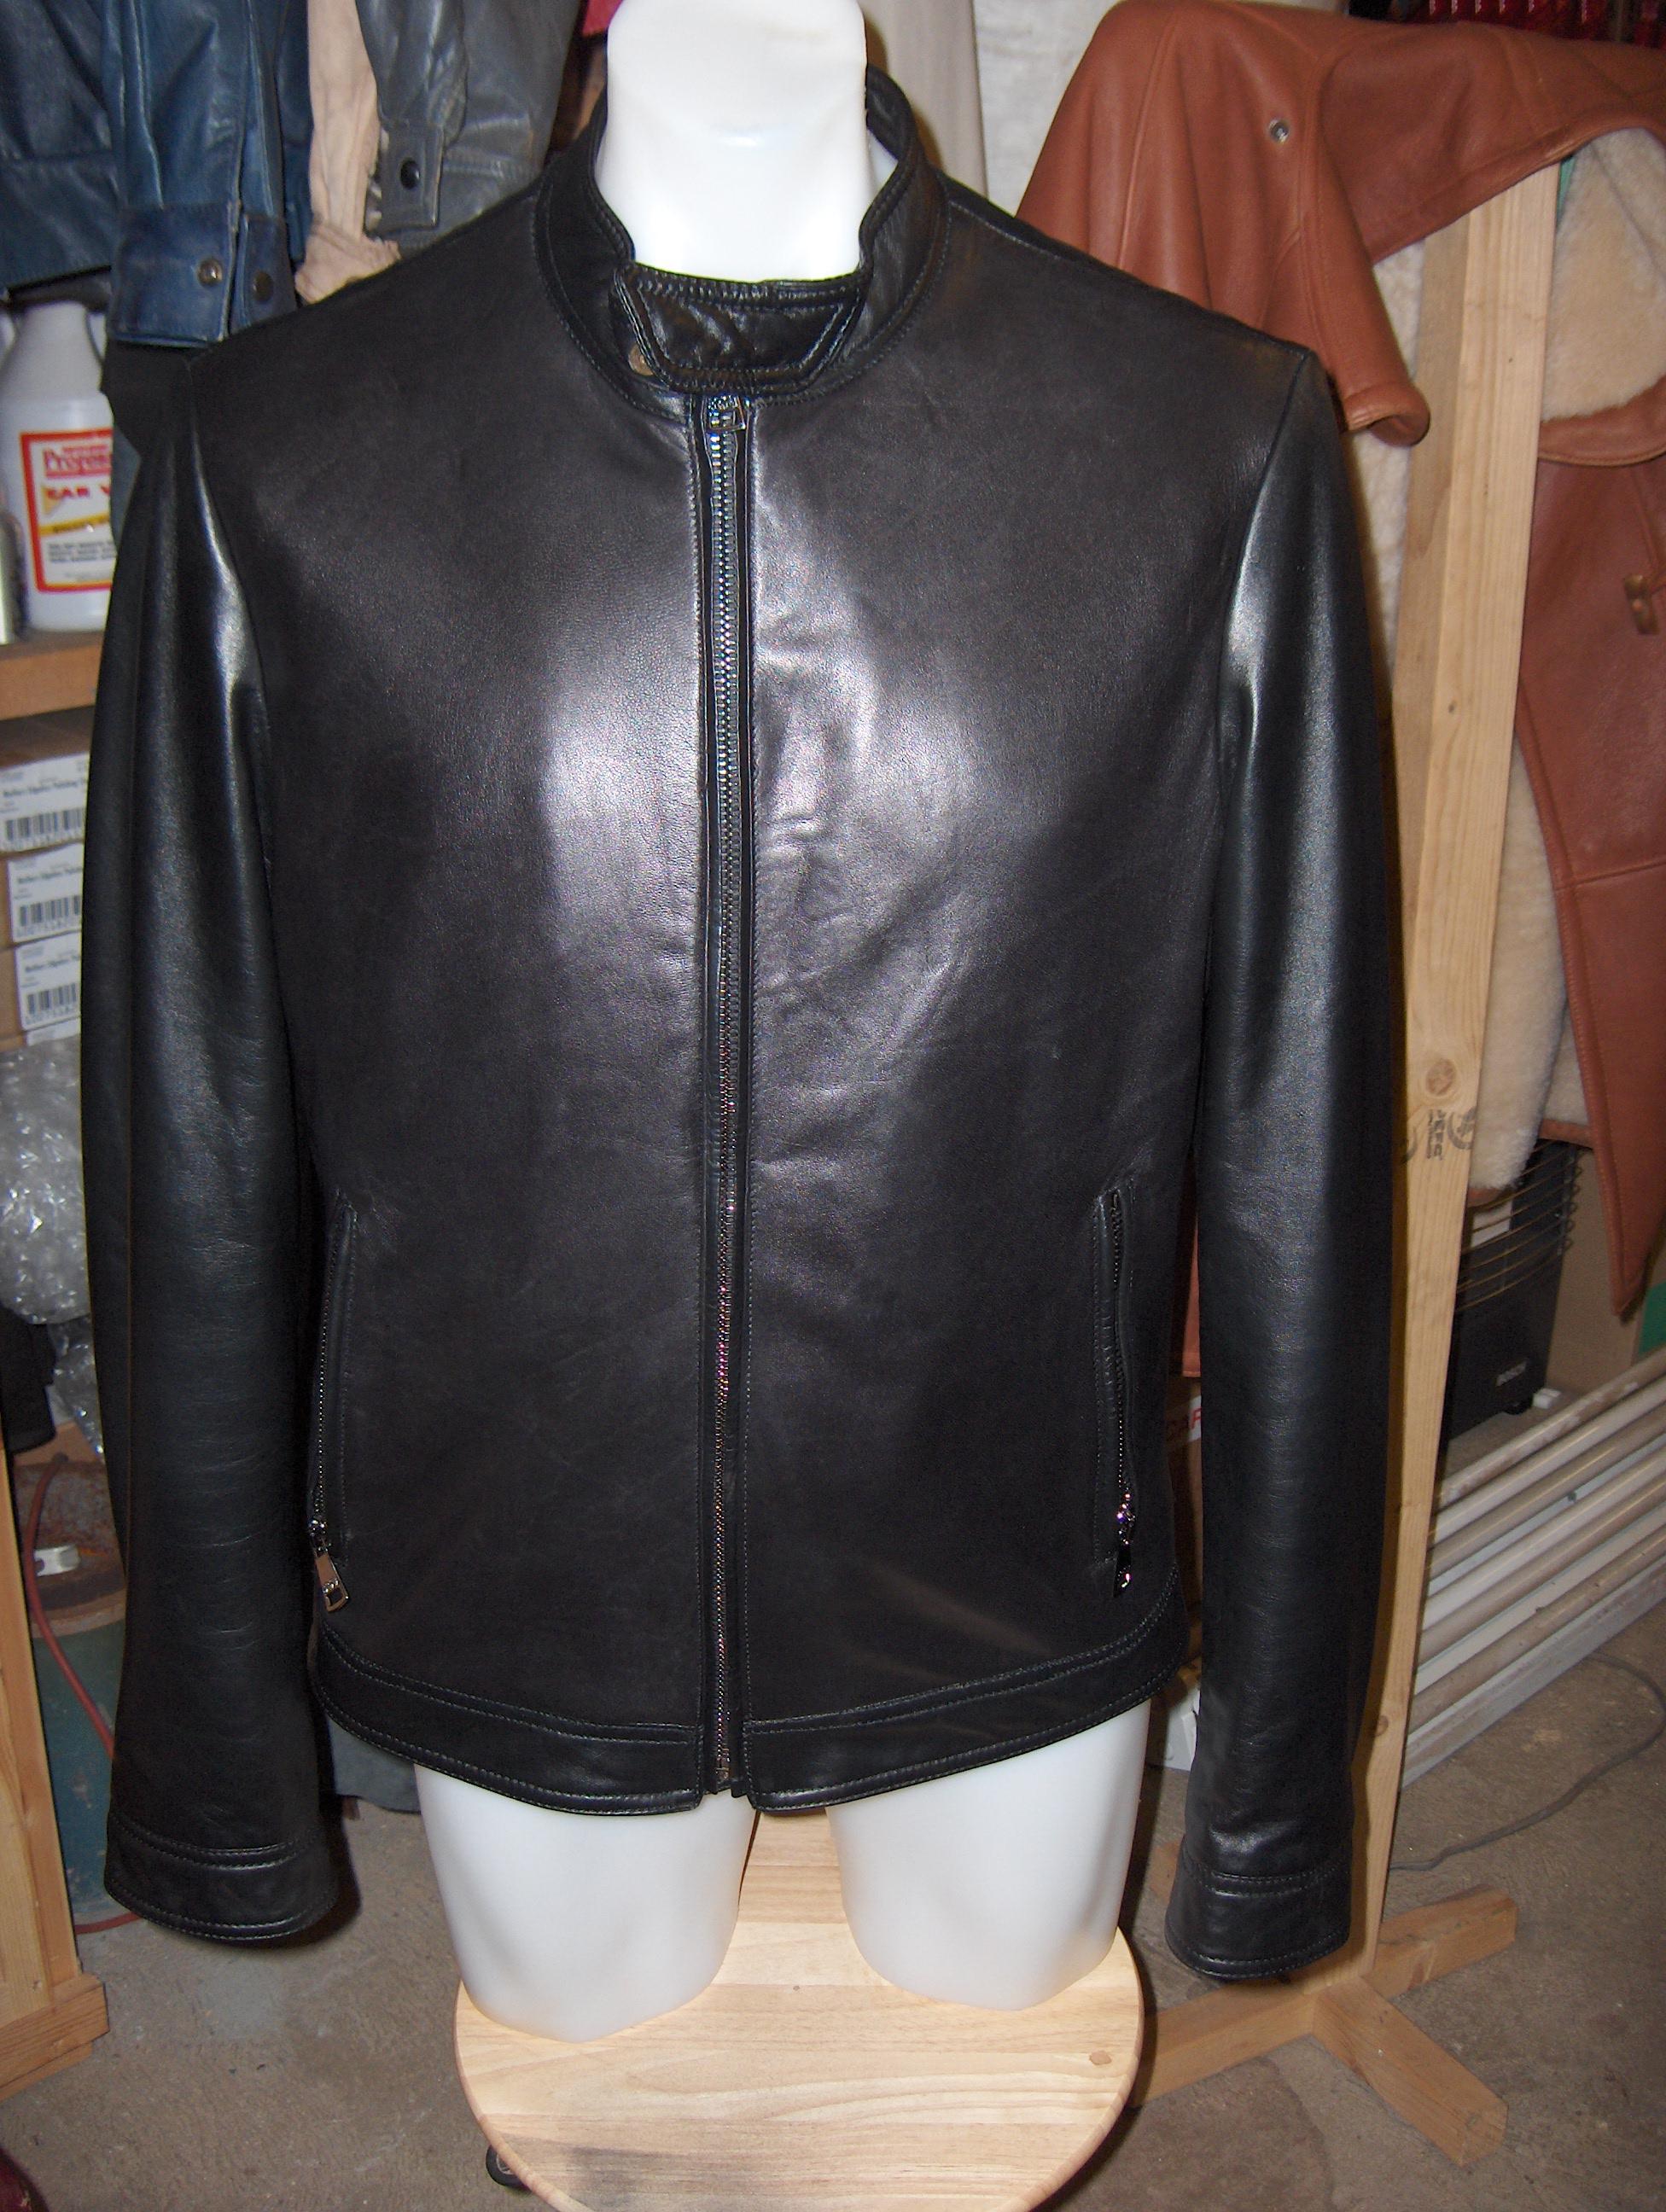 dolce-gabbana-jacket-repaired